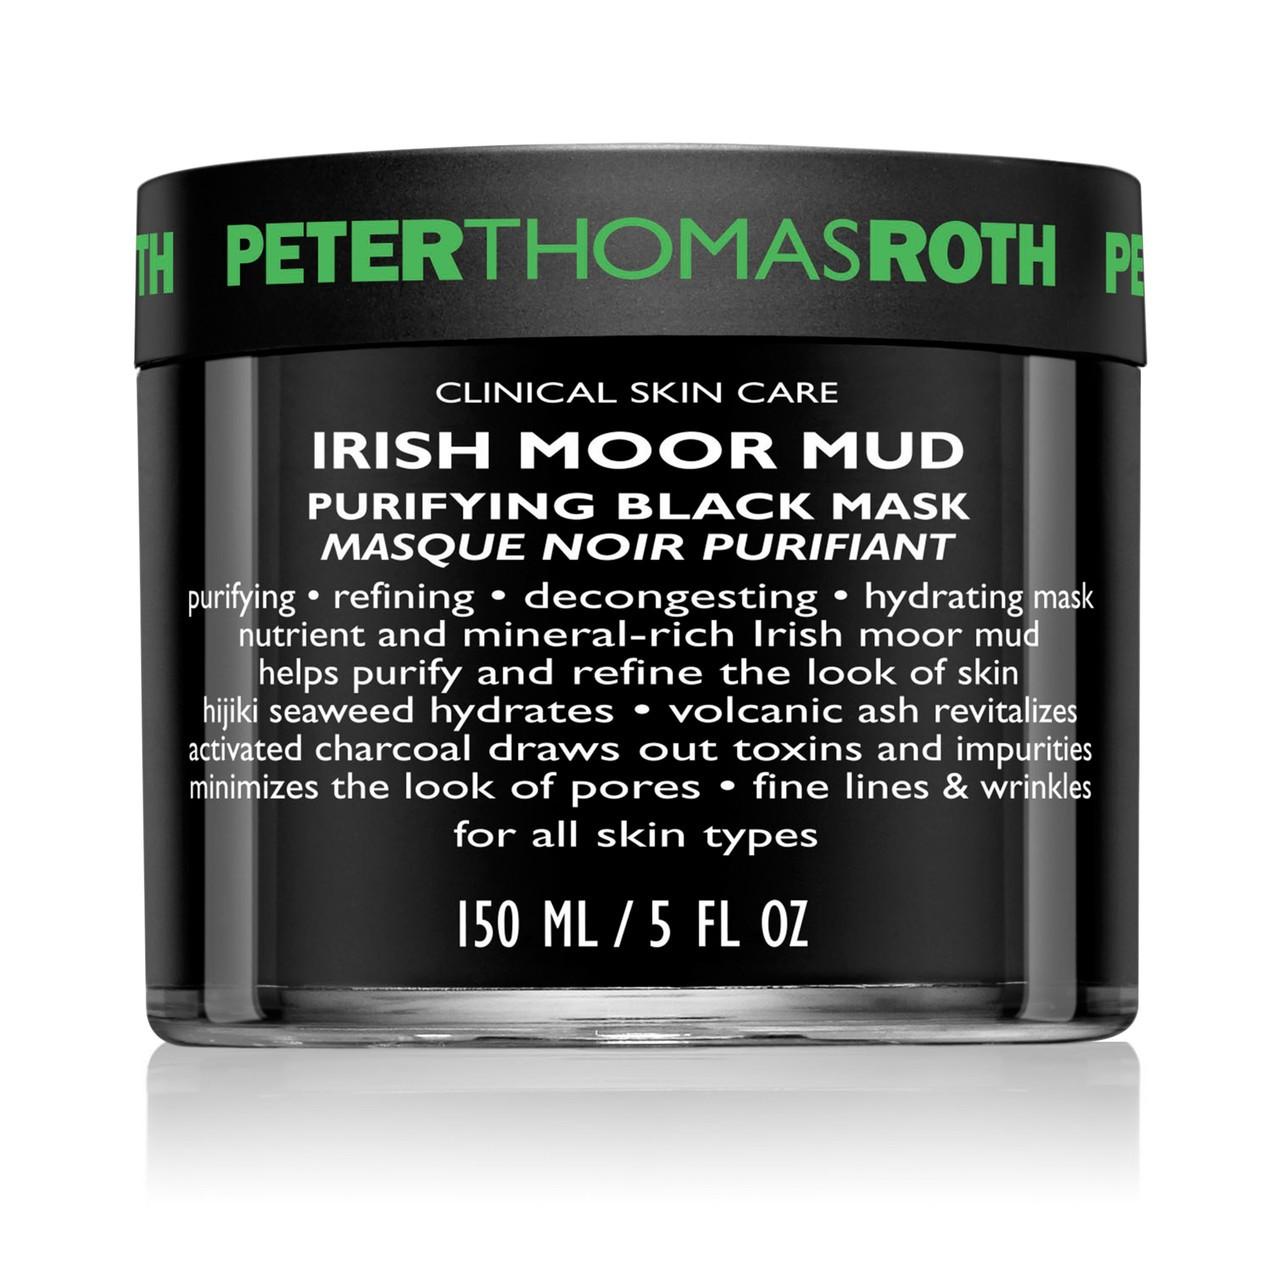 Peter Thomas Roth Irish Moor Mud Purifying Black Mask 5 oz